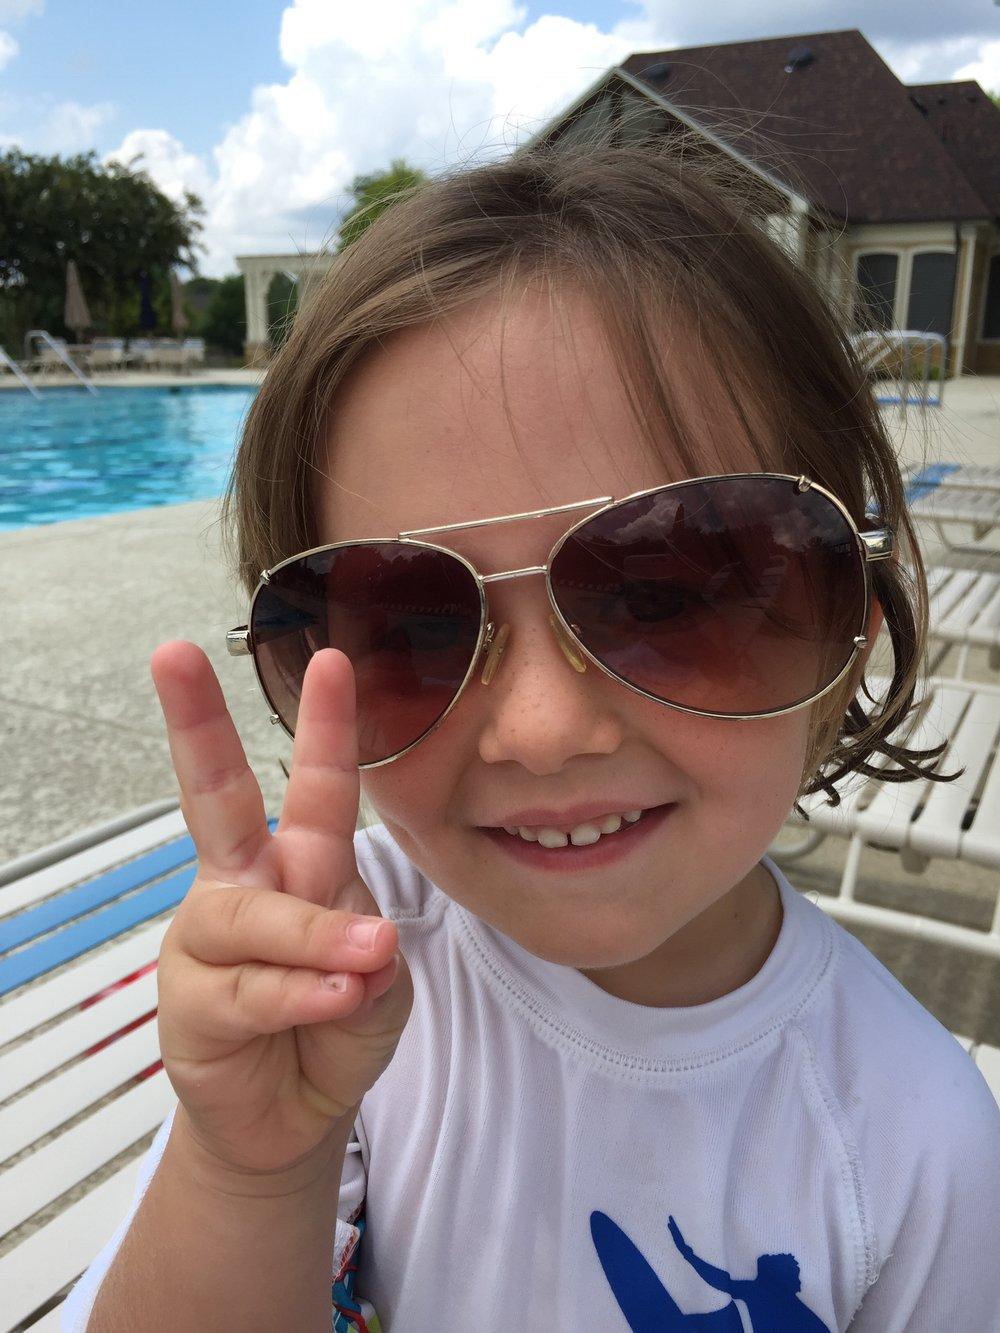 tegan peace sunglasses.JPG